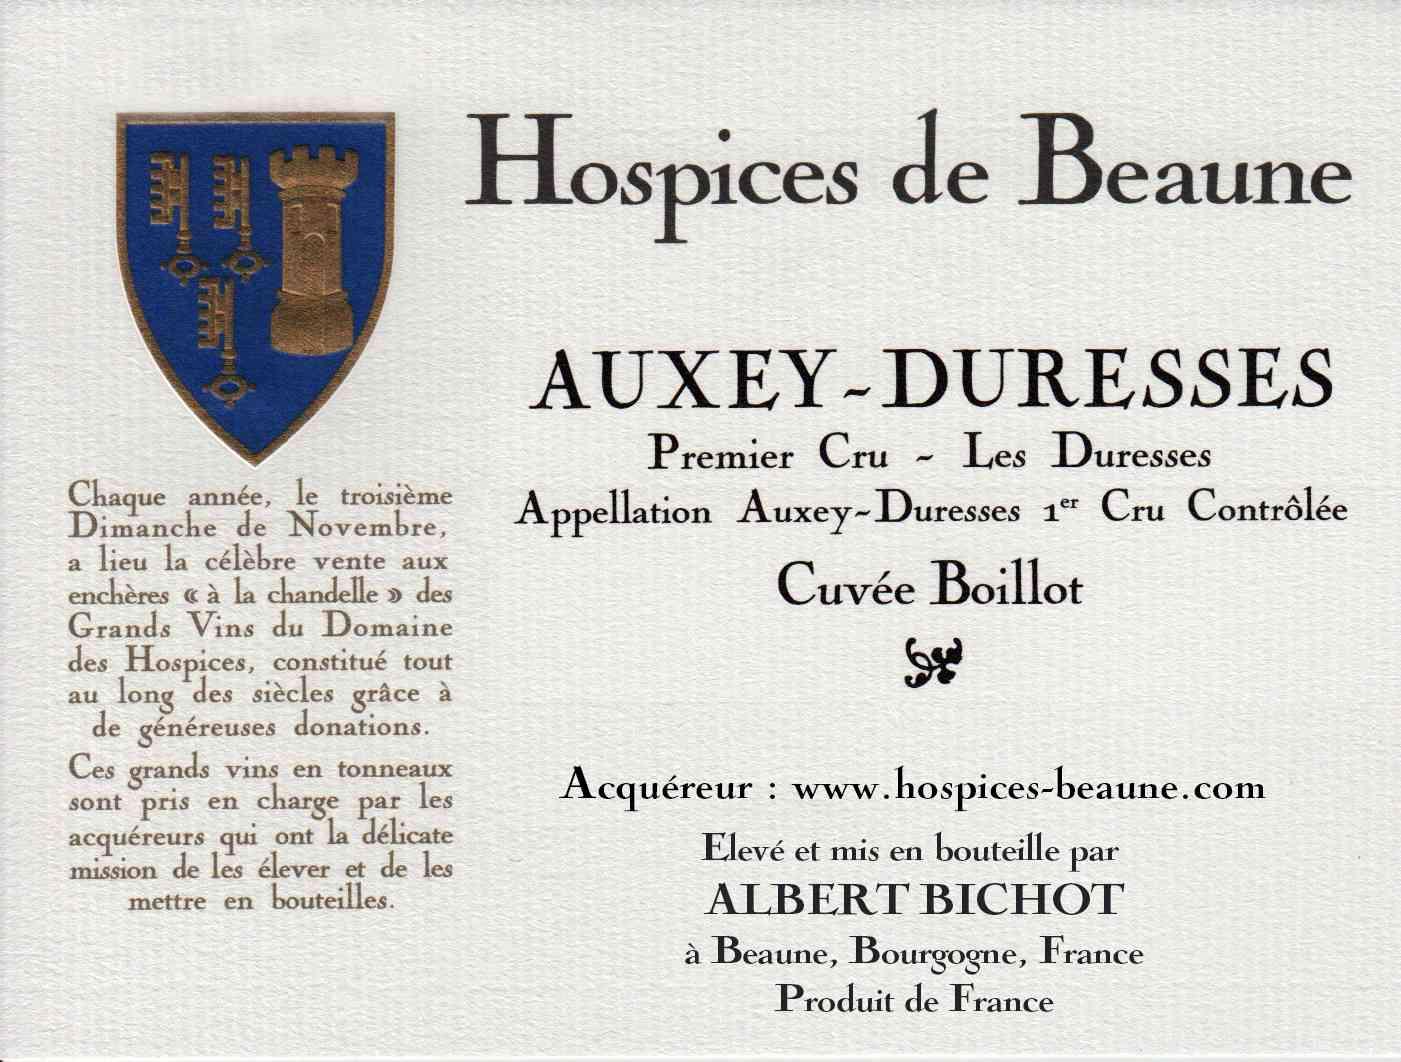 Encheres-auction-HospicesdeBeaune-AlbertBichot-AuxeyDuresses-PremierCru-Cuvee-Boillot